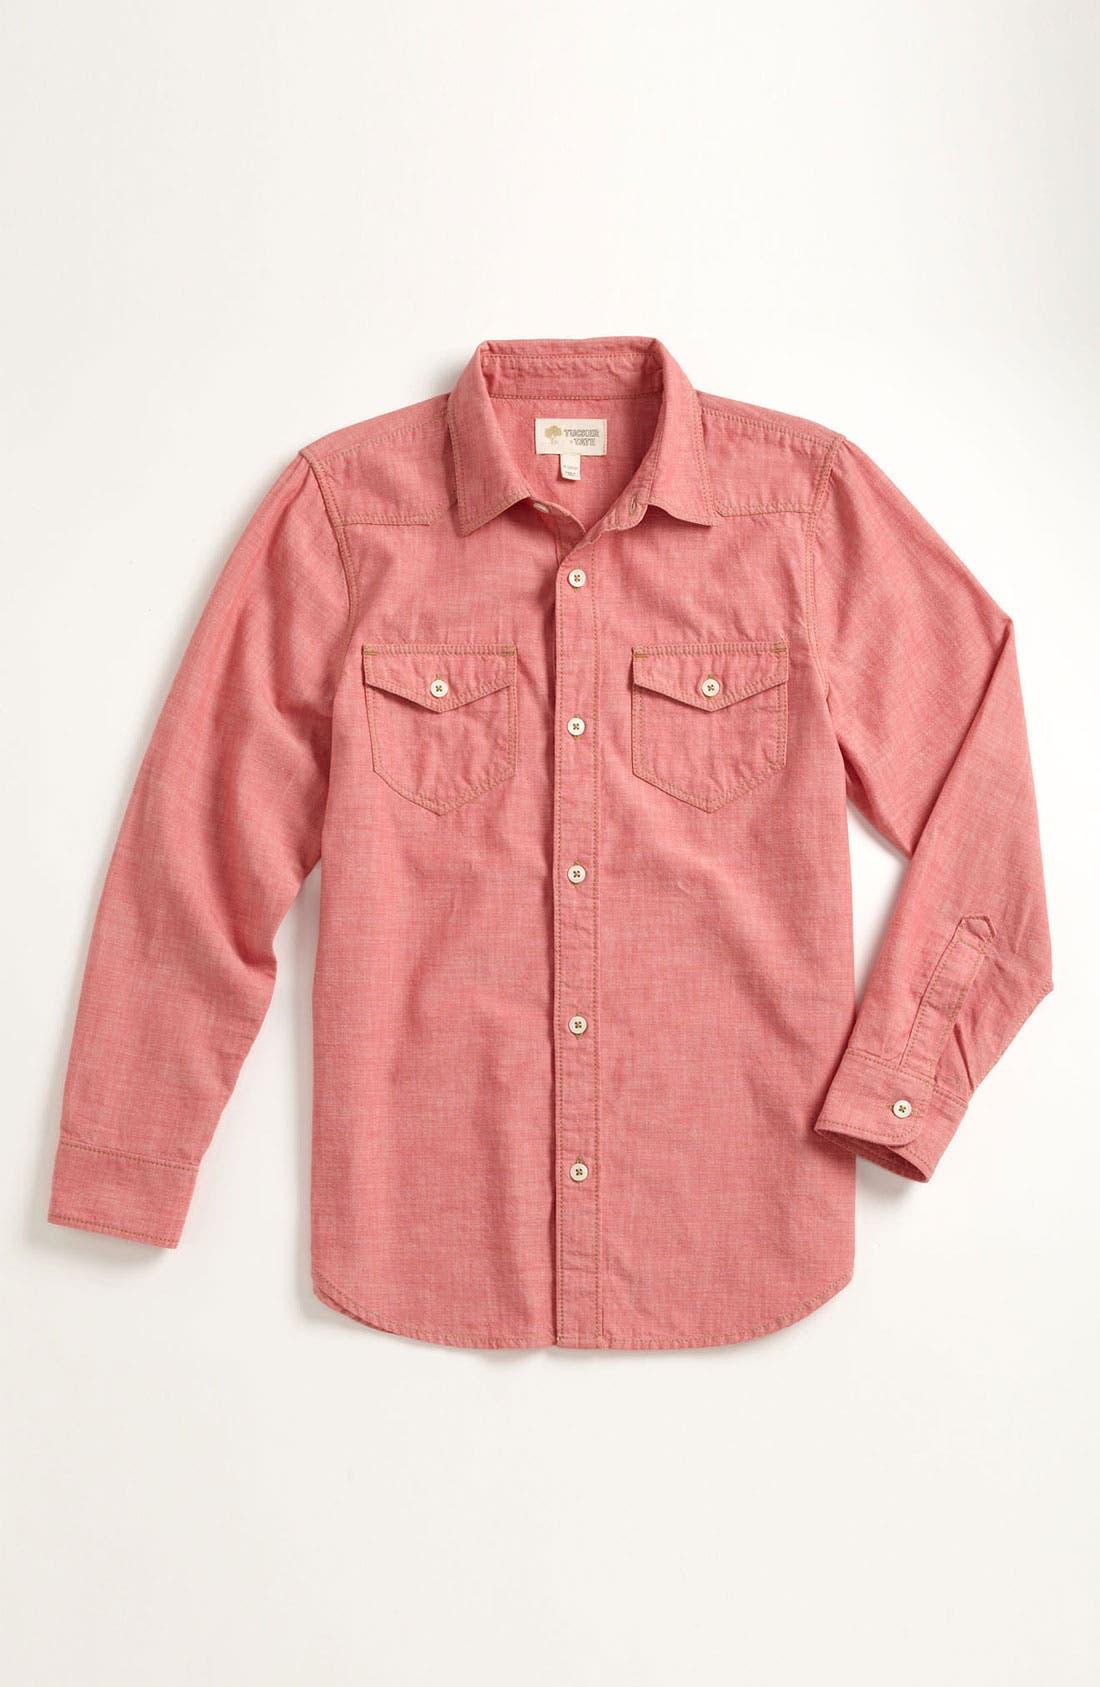 Main Image - Tucker + Tate 'Benson' Chambray Shirt (Little Boys)